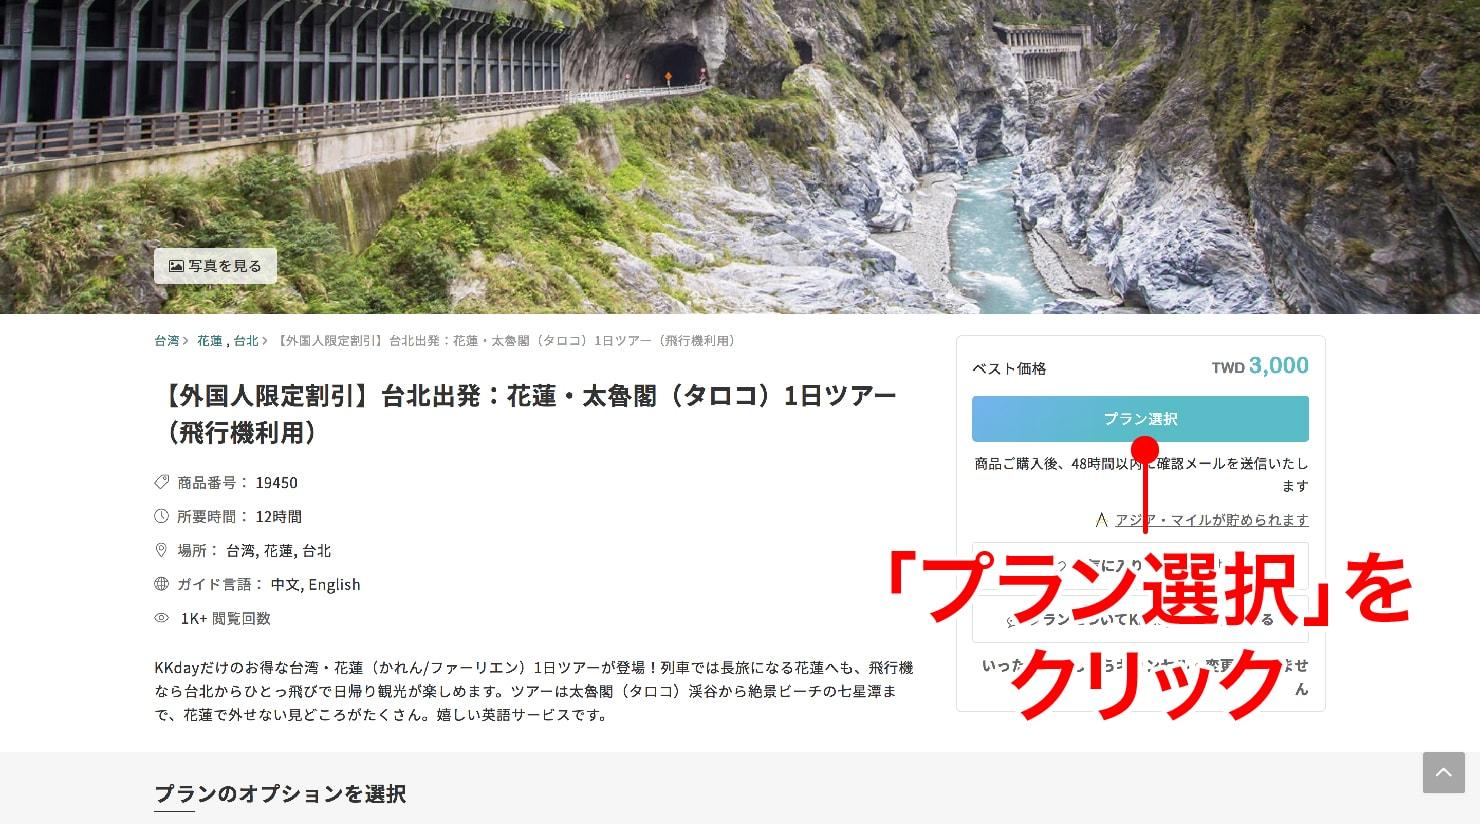 KKday外国人限定「花蓮・太魯閣(タロコ)日帰りツアー」の予約画面3